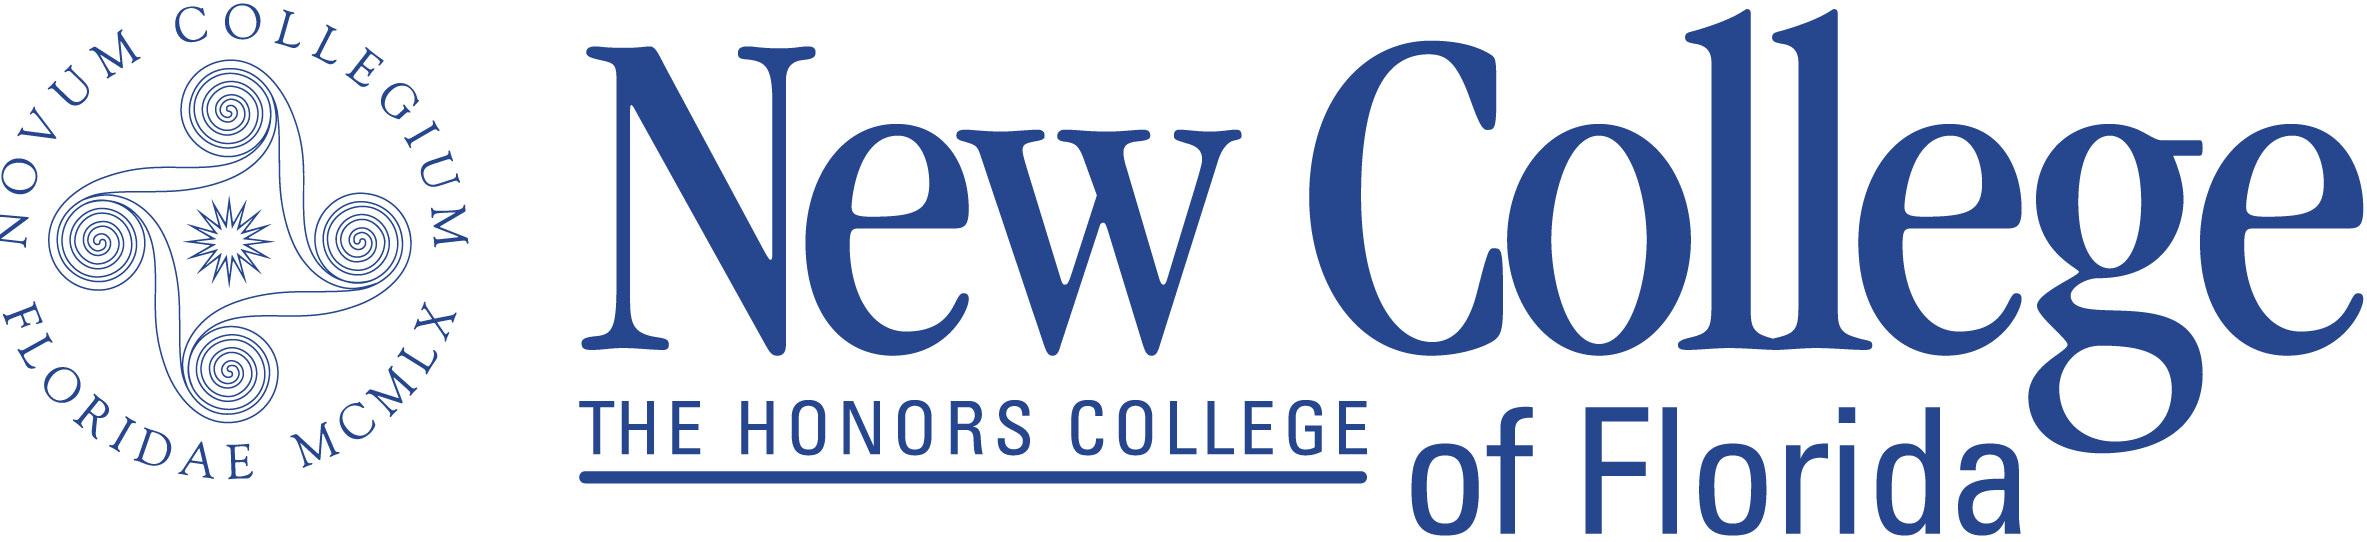 New College of Florida (U.S.)